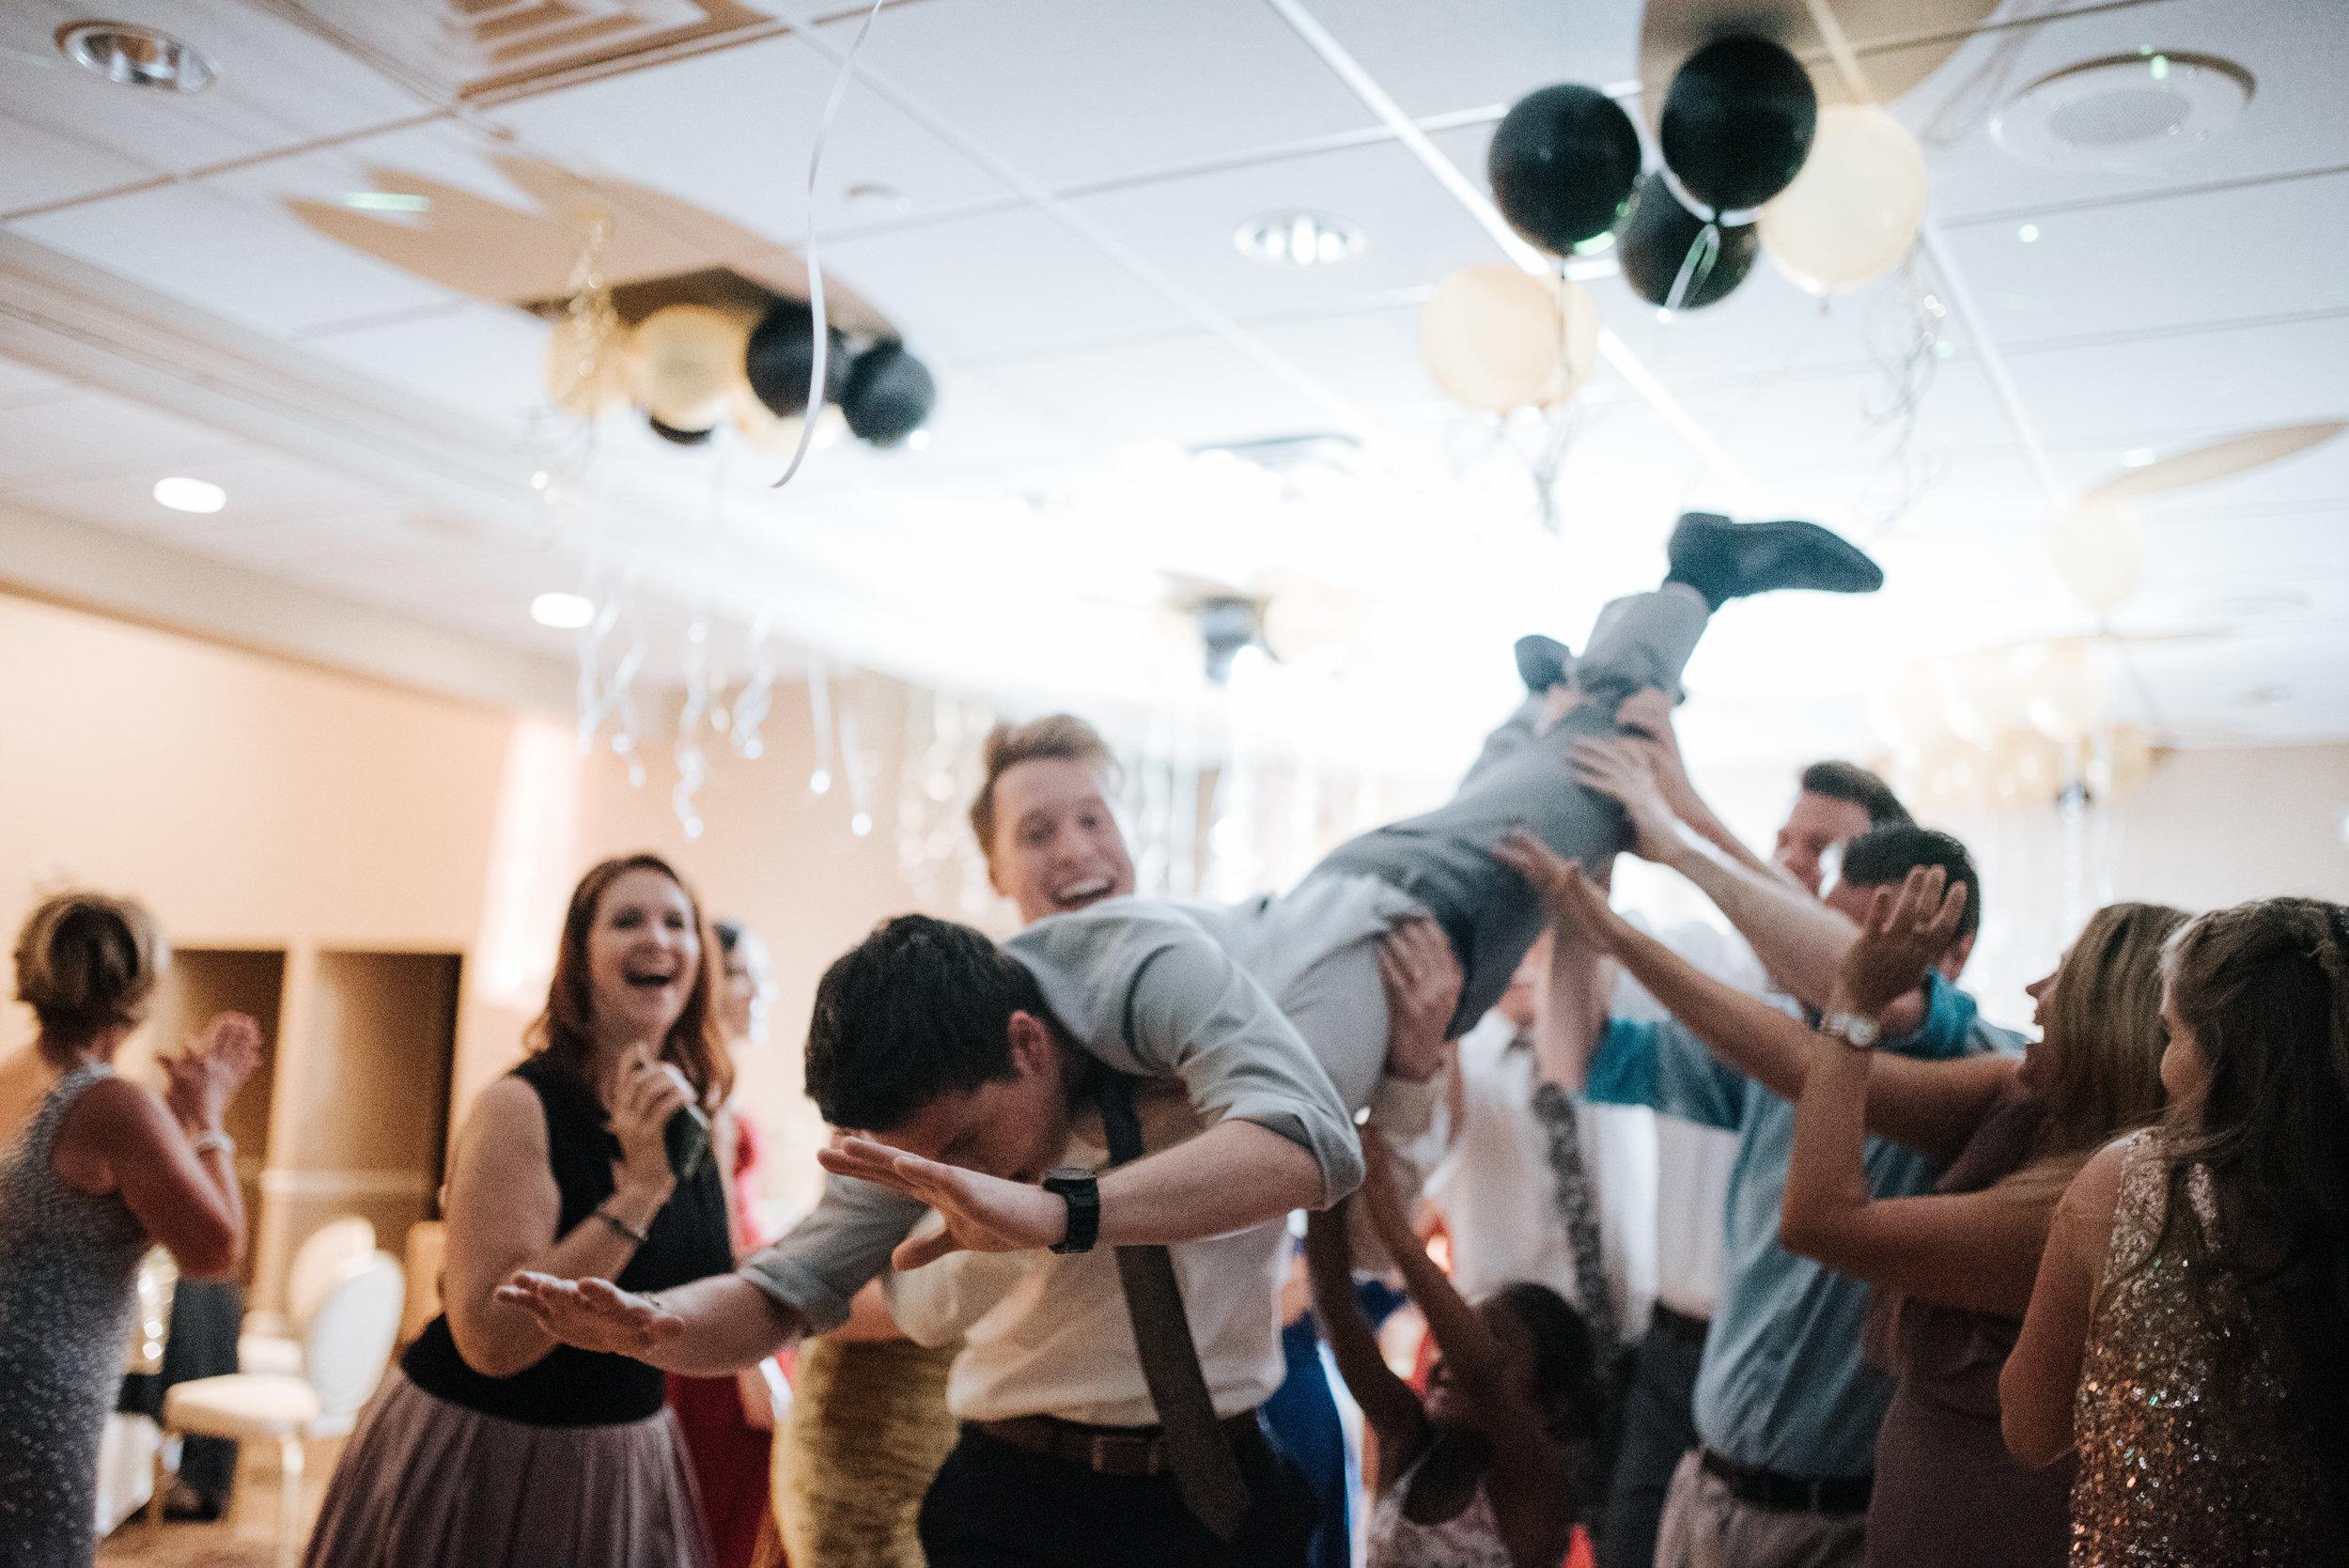 zayda-collin-panama-city-wedding-photography-trippy-bohemian-lisa-frank-wedding-dancing-party-136.jpg